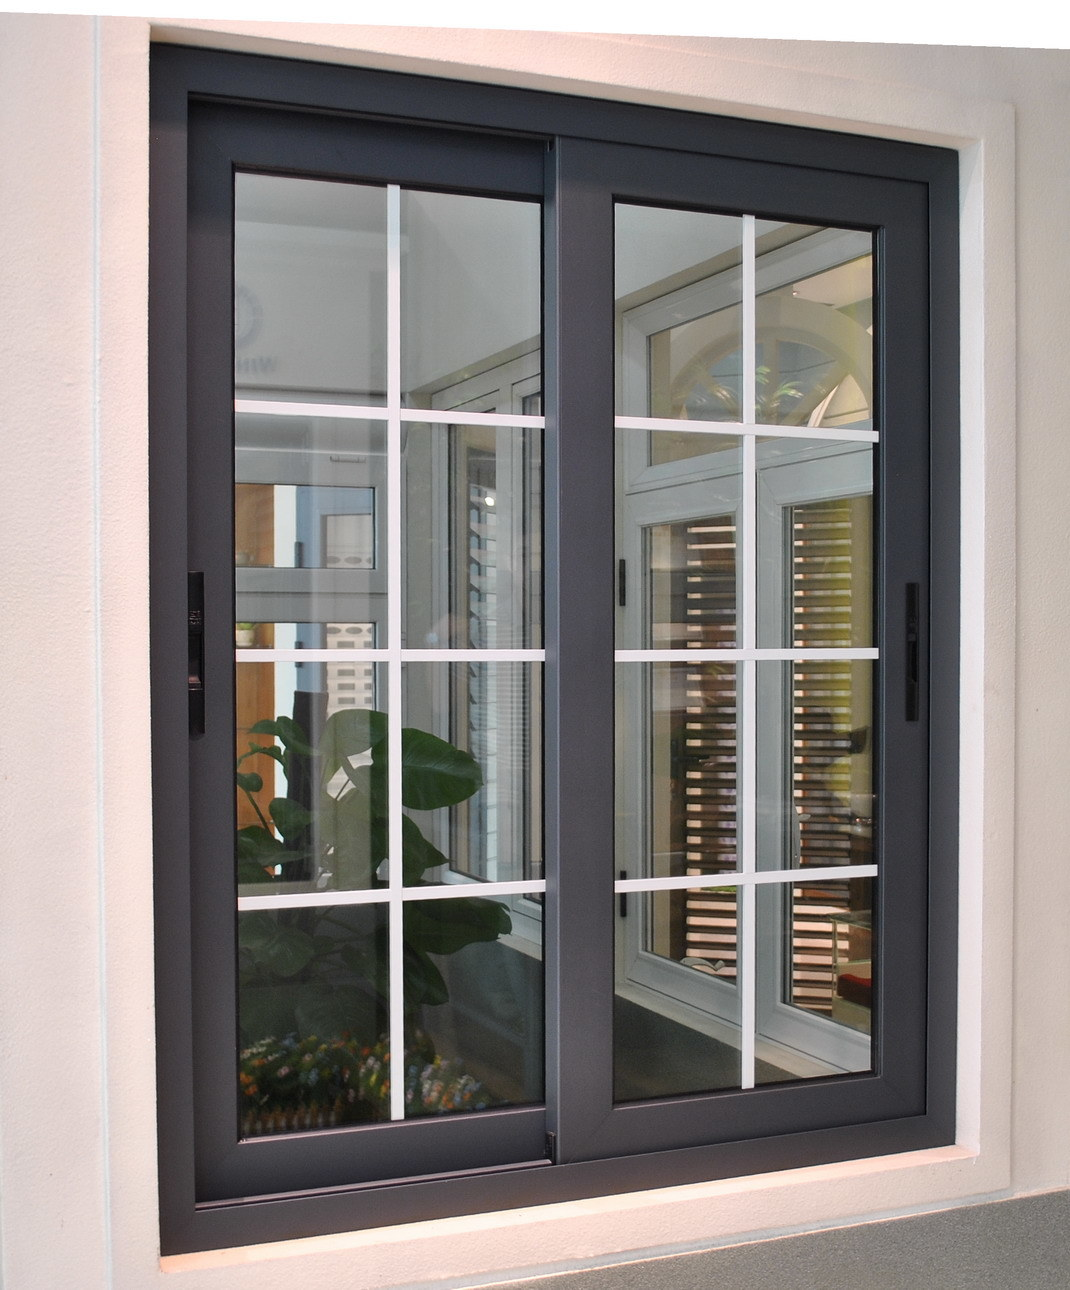 Glass window design - 2014 Hot Sale Glass Grill Window Design Aluminum Sliding Window